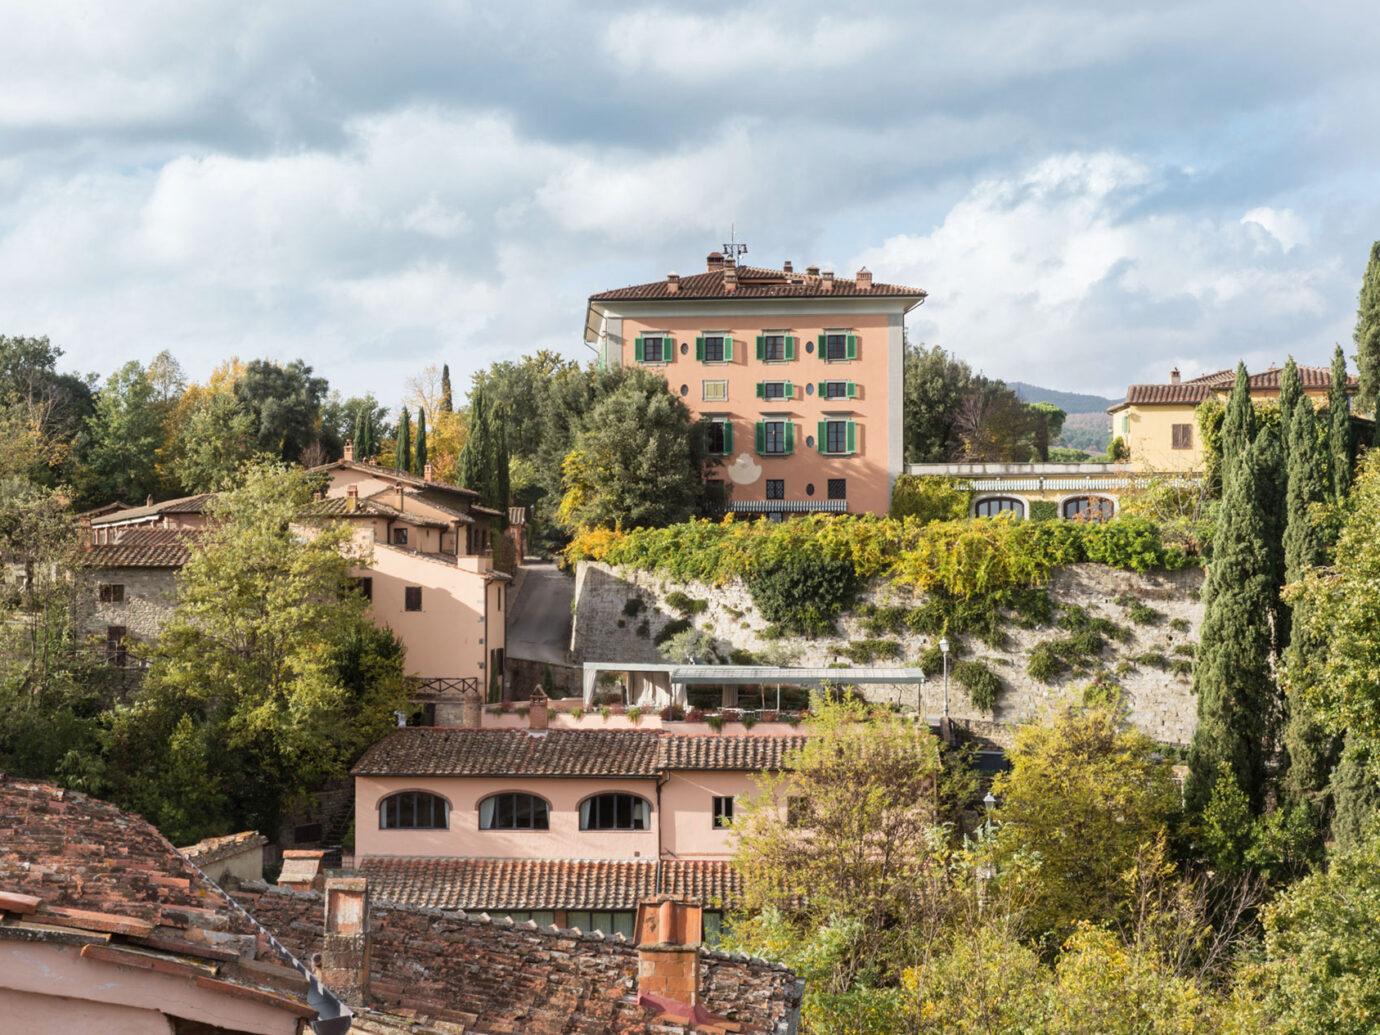 Grounds at Il Borro Relais, Tuscany